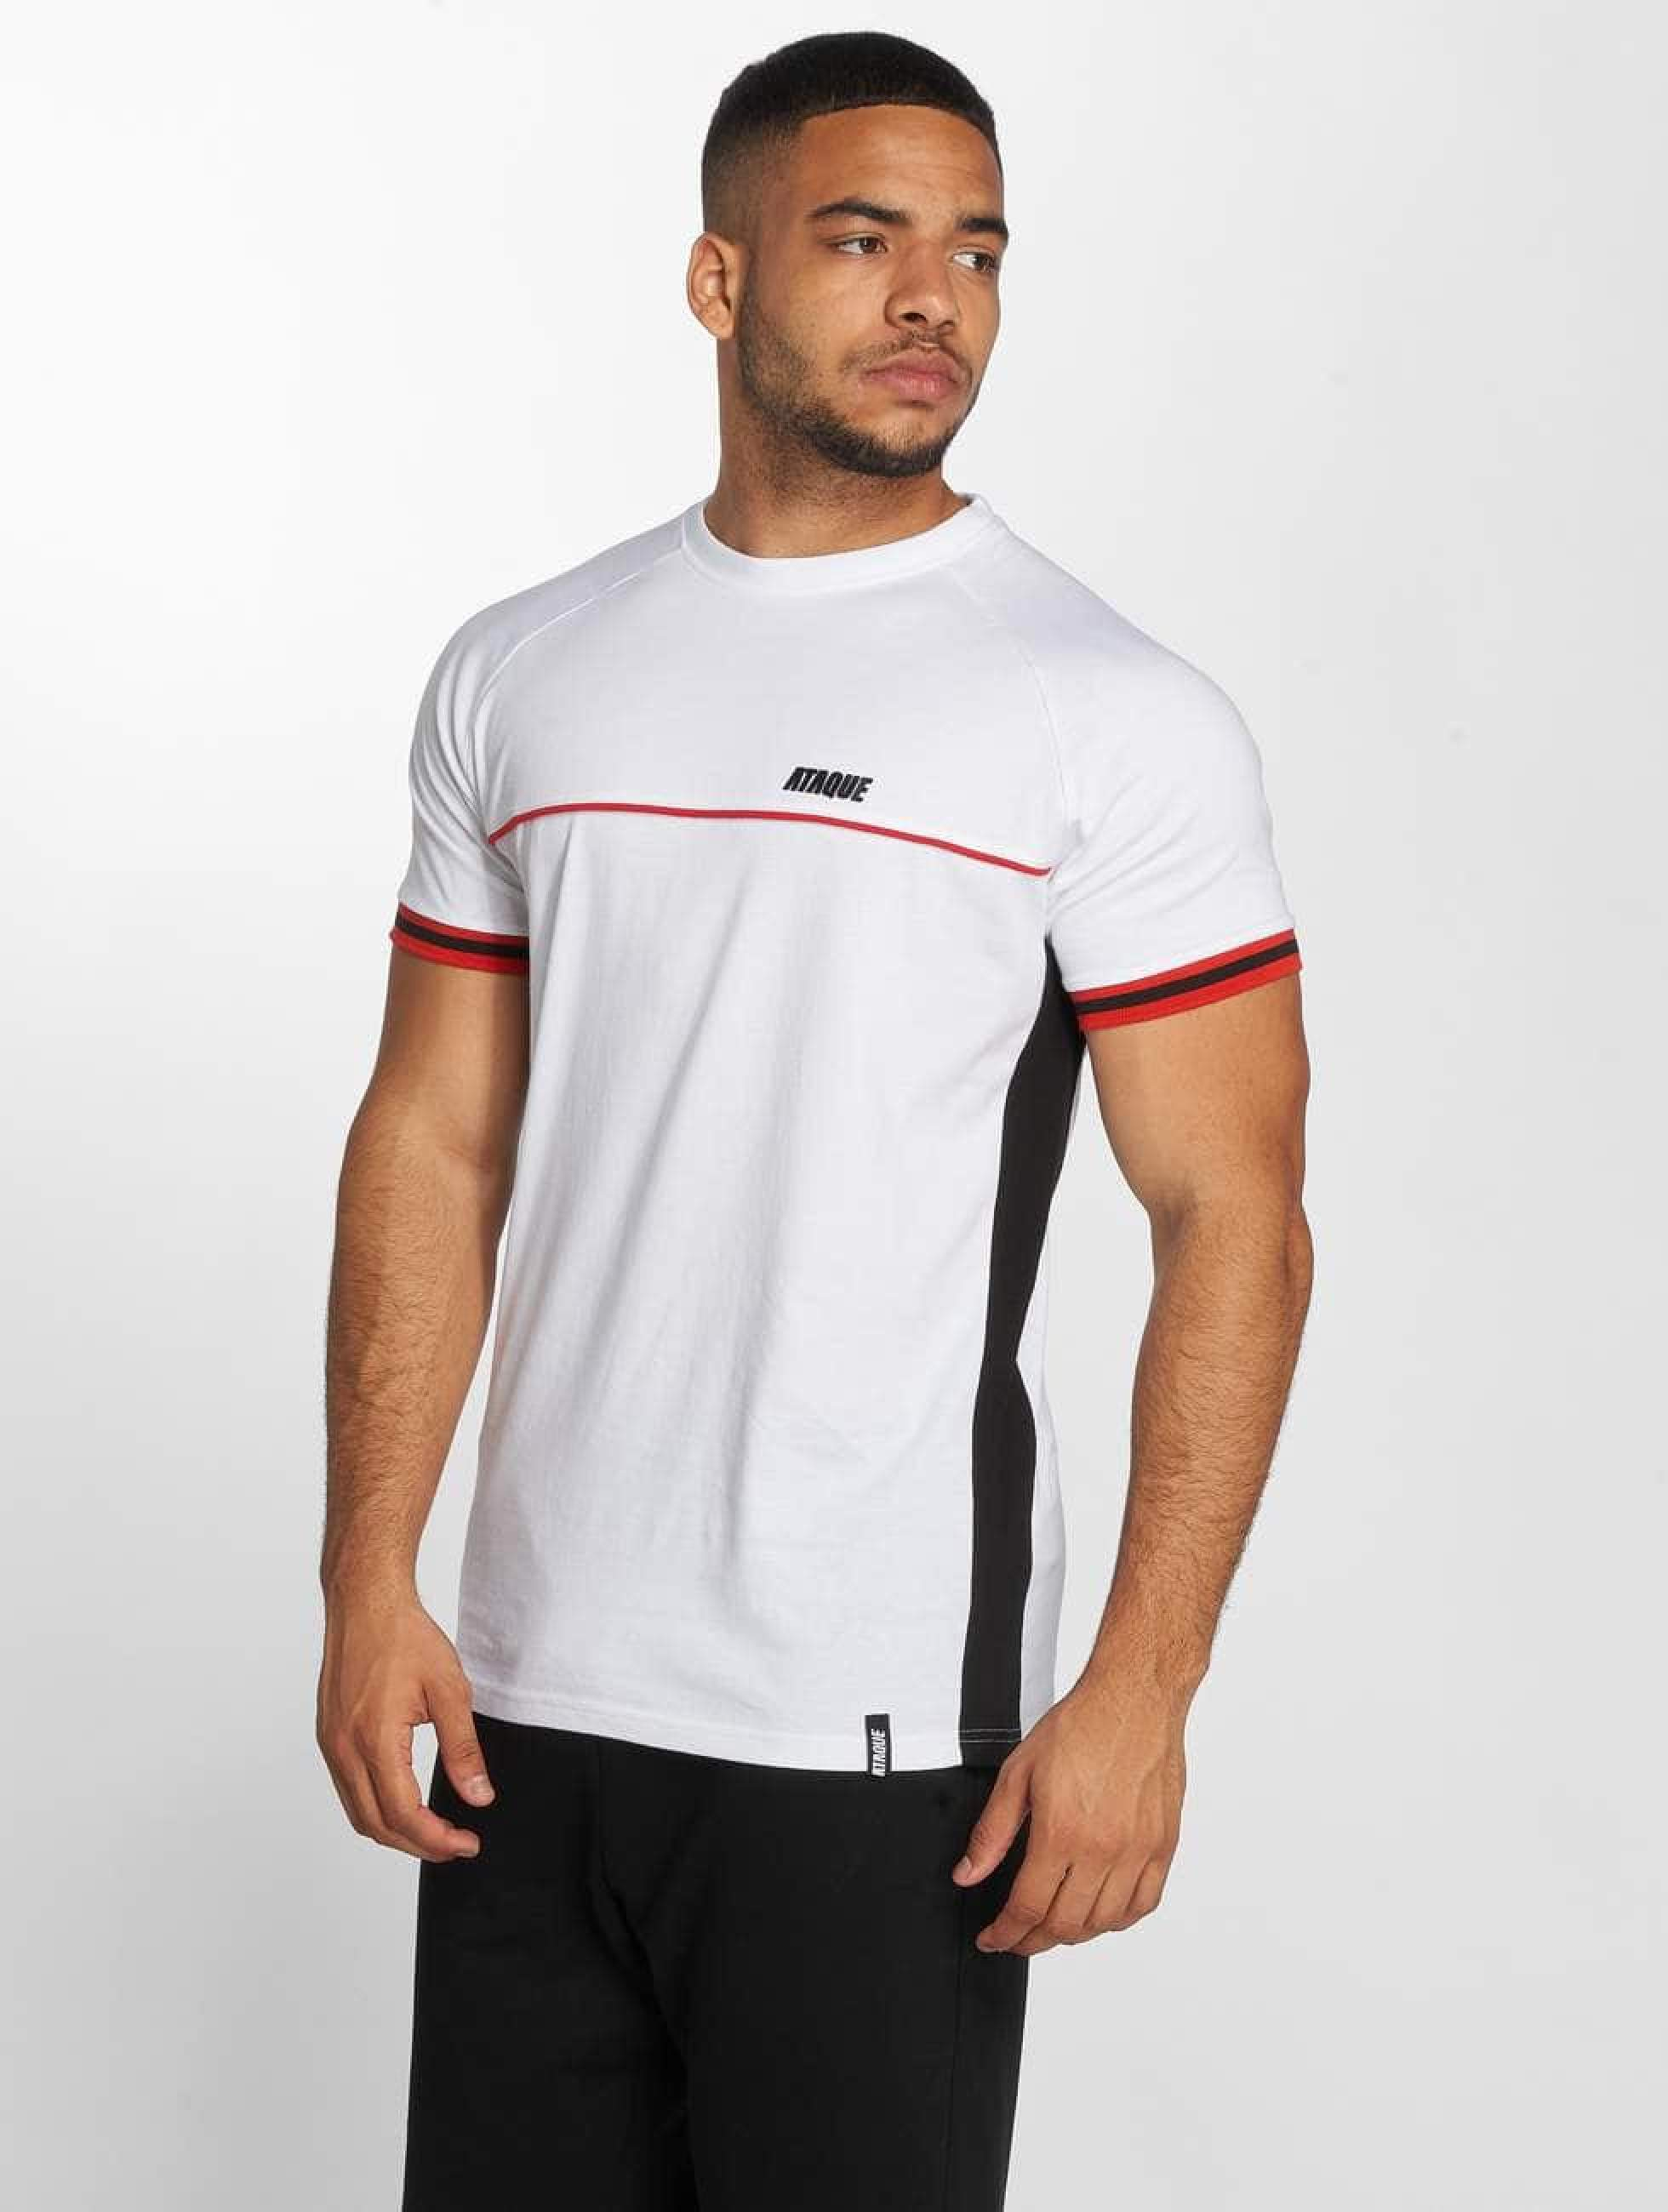 Ataque / T-Shirt Baza in white 3XL